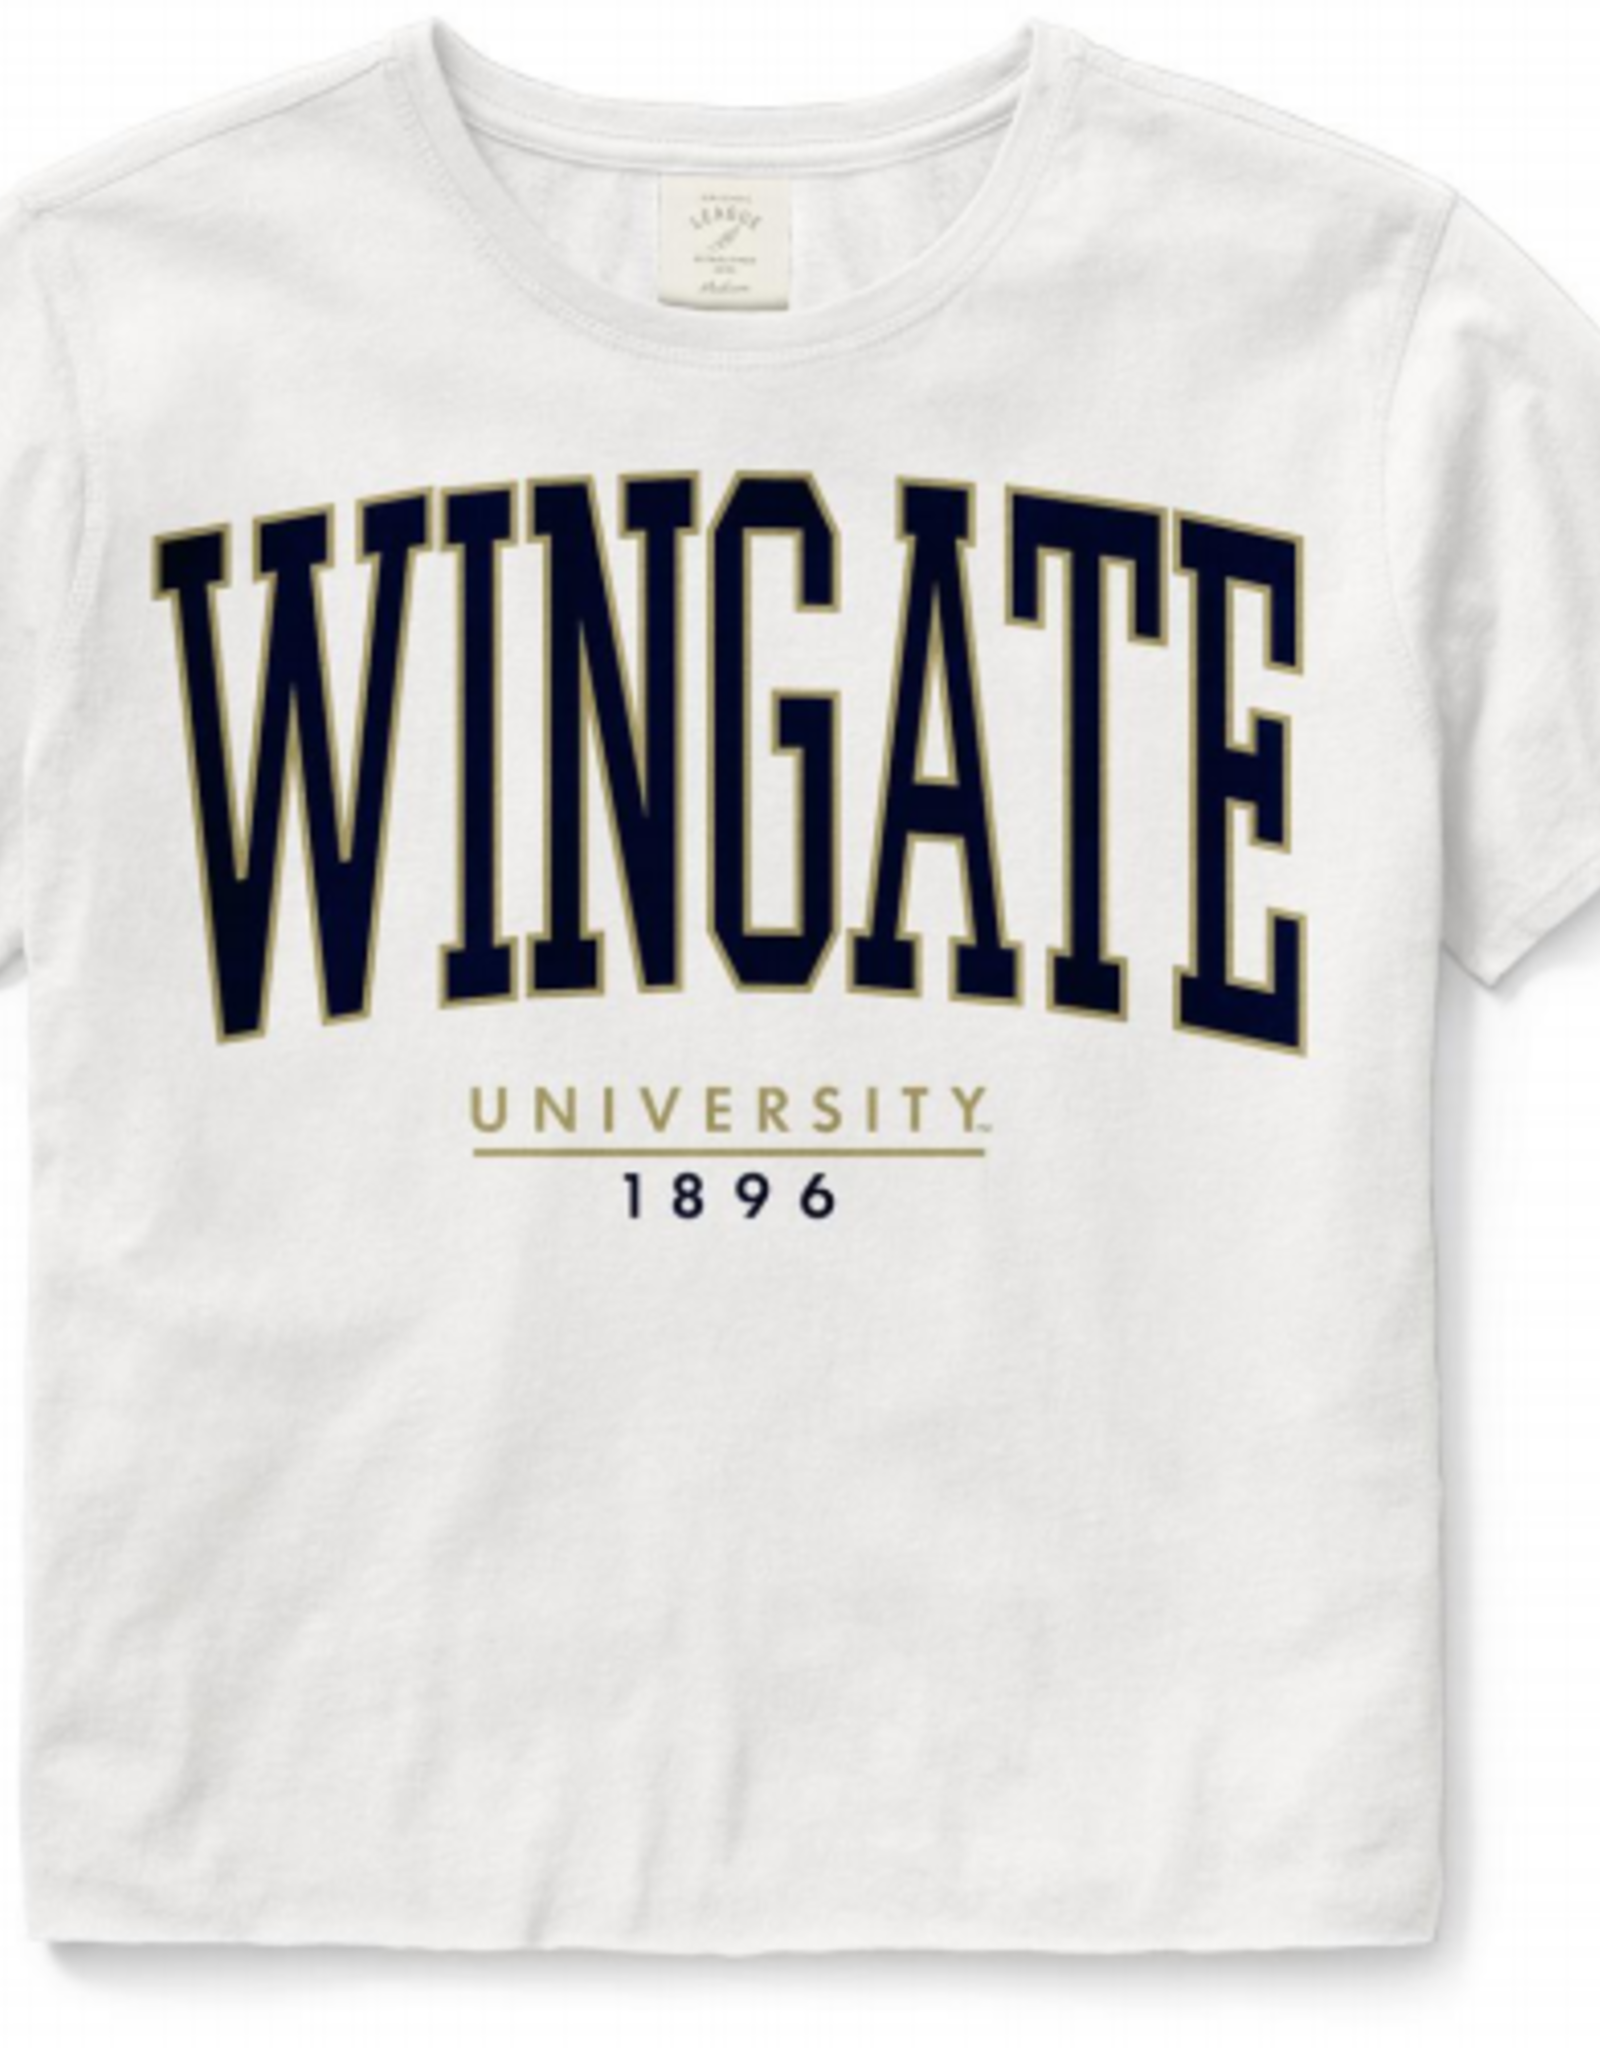 League Ladies White Crop Wingate University SS Tee